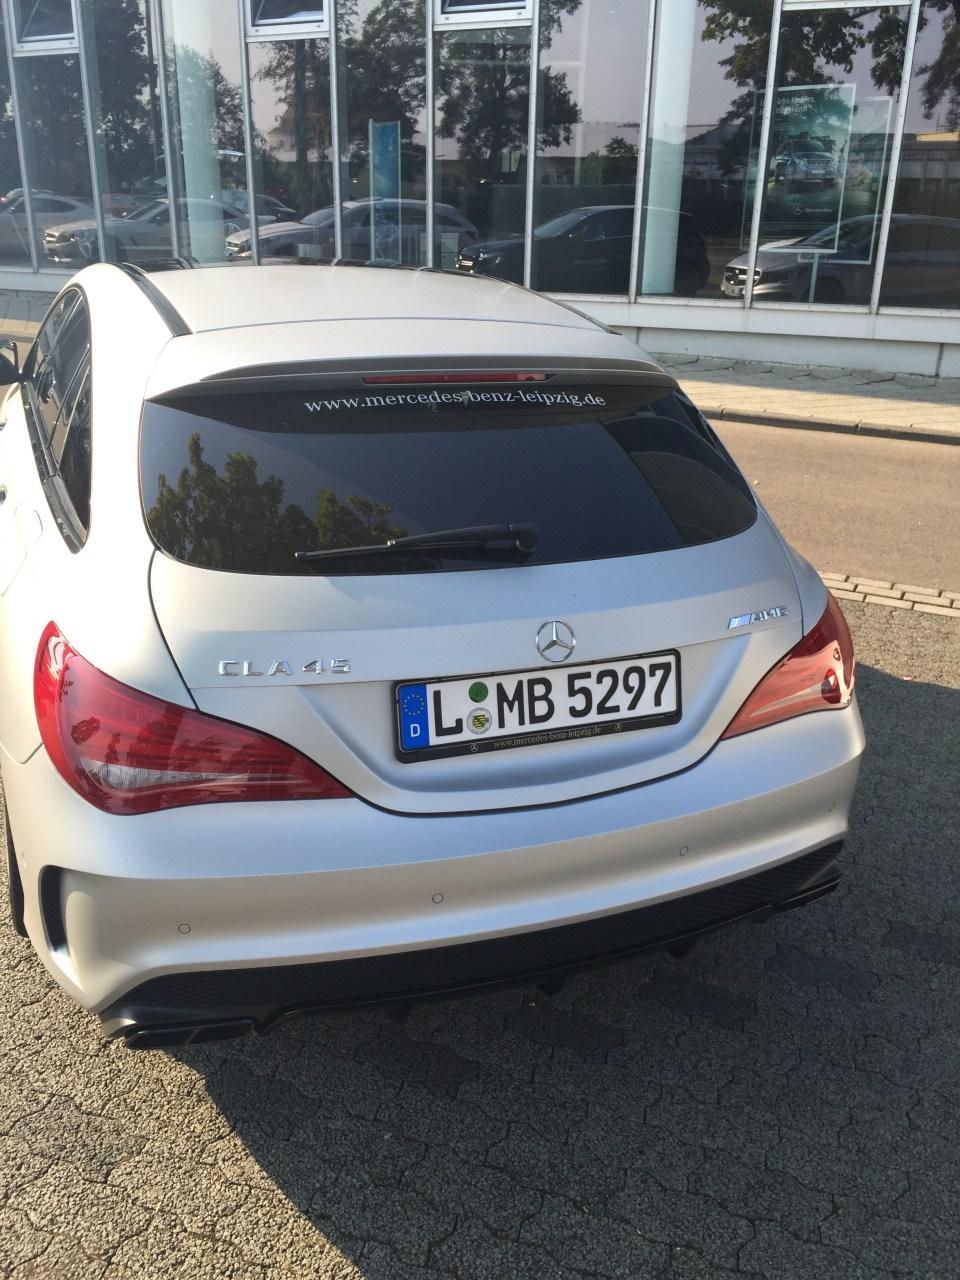 Mercedes-Benz AMG Performance Tour - CLA 45 AMG